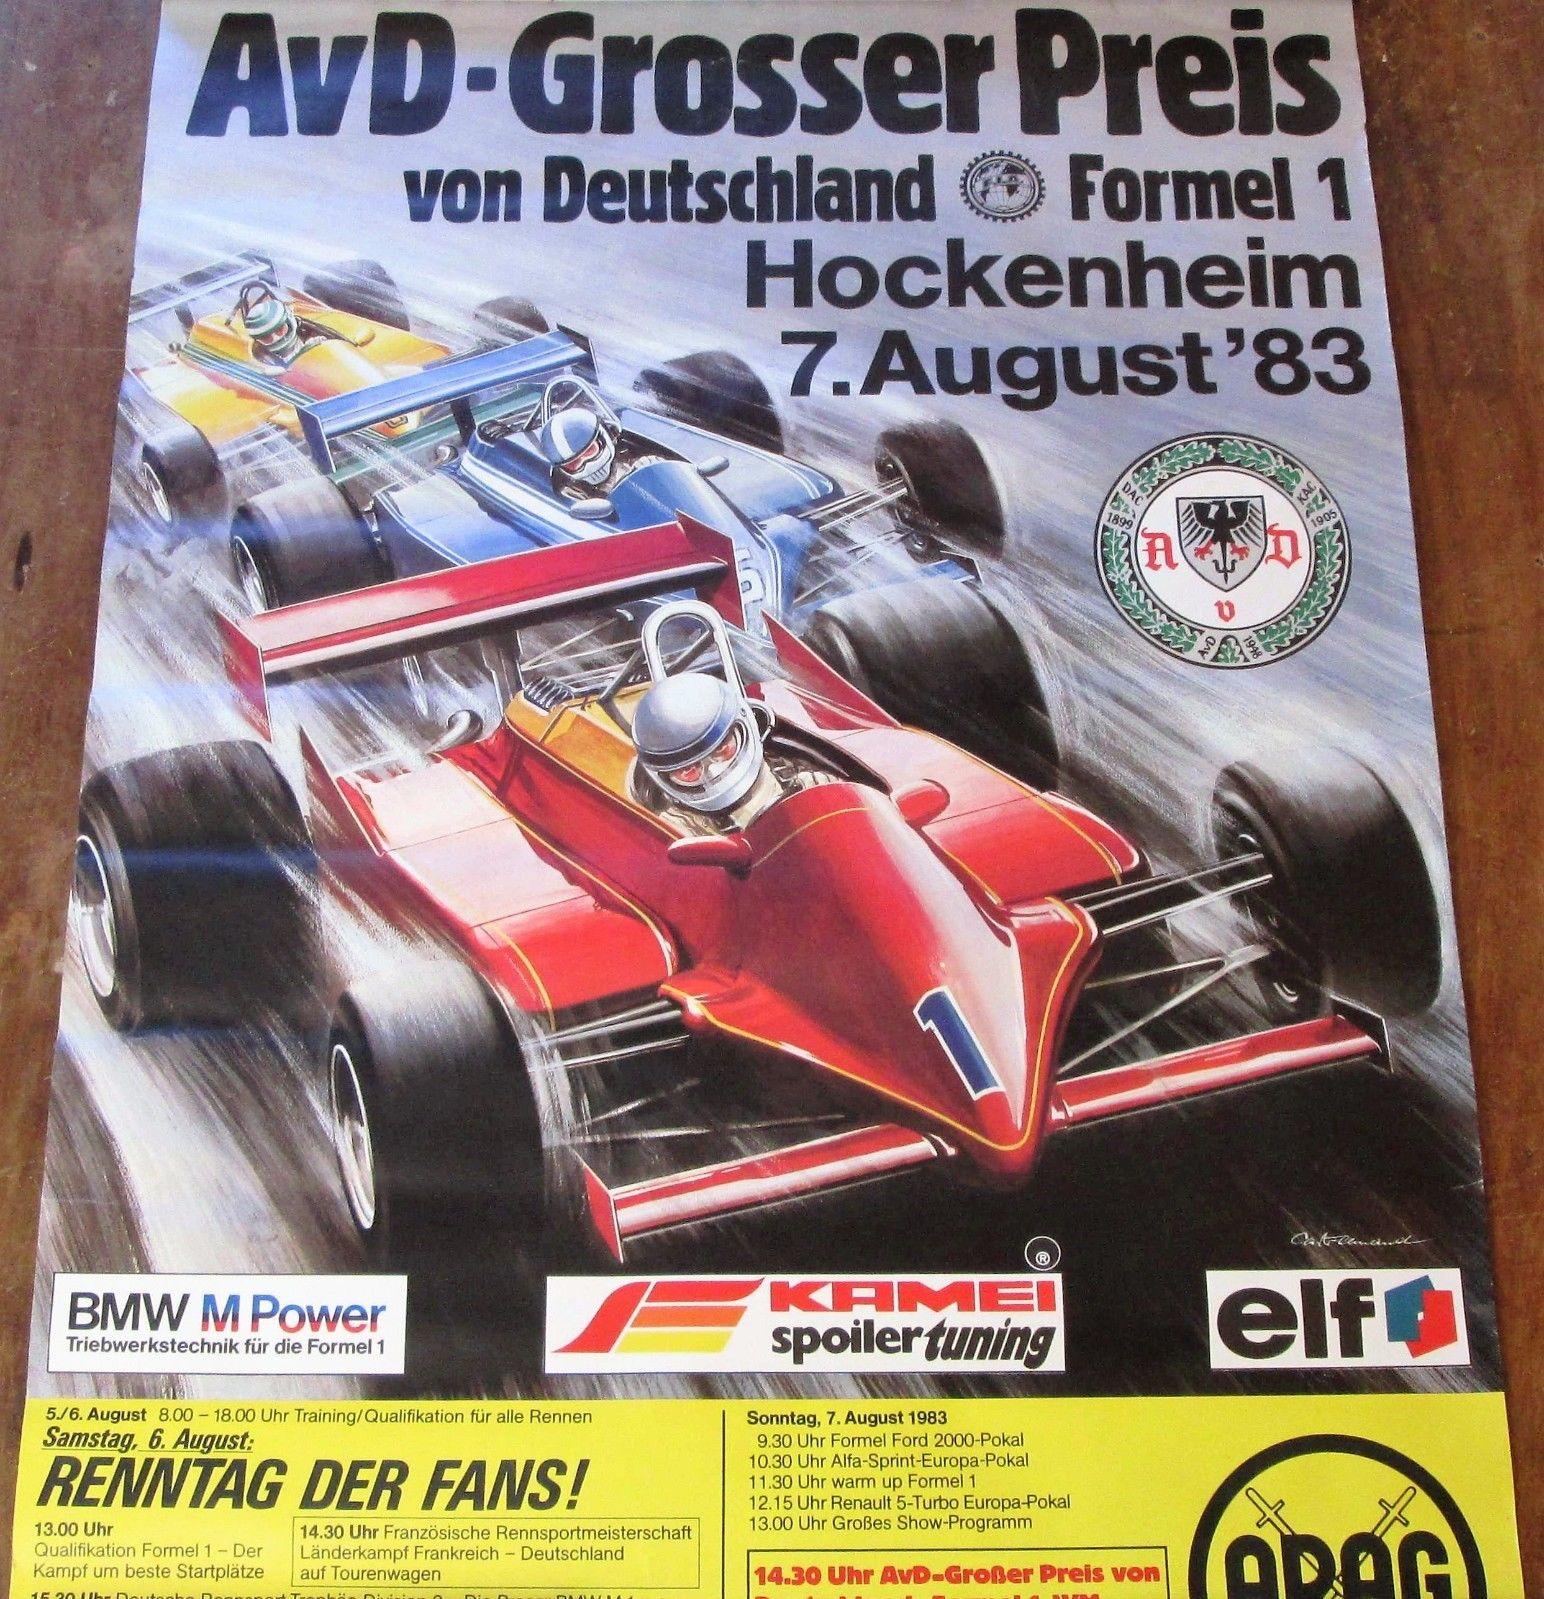 1983 Hockenheim F1 GP Poster